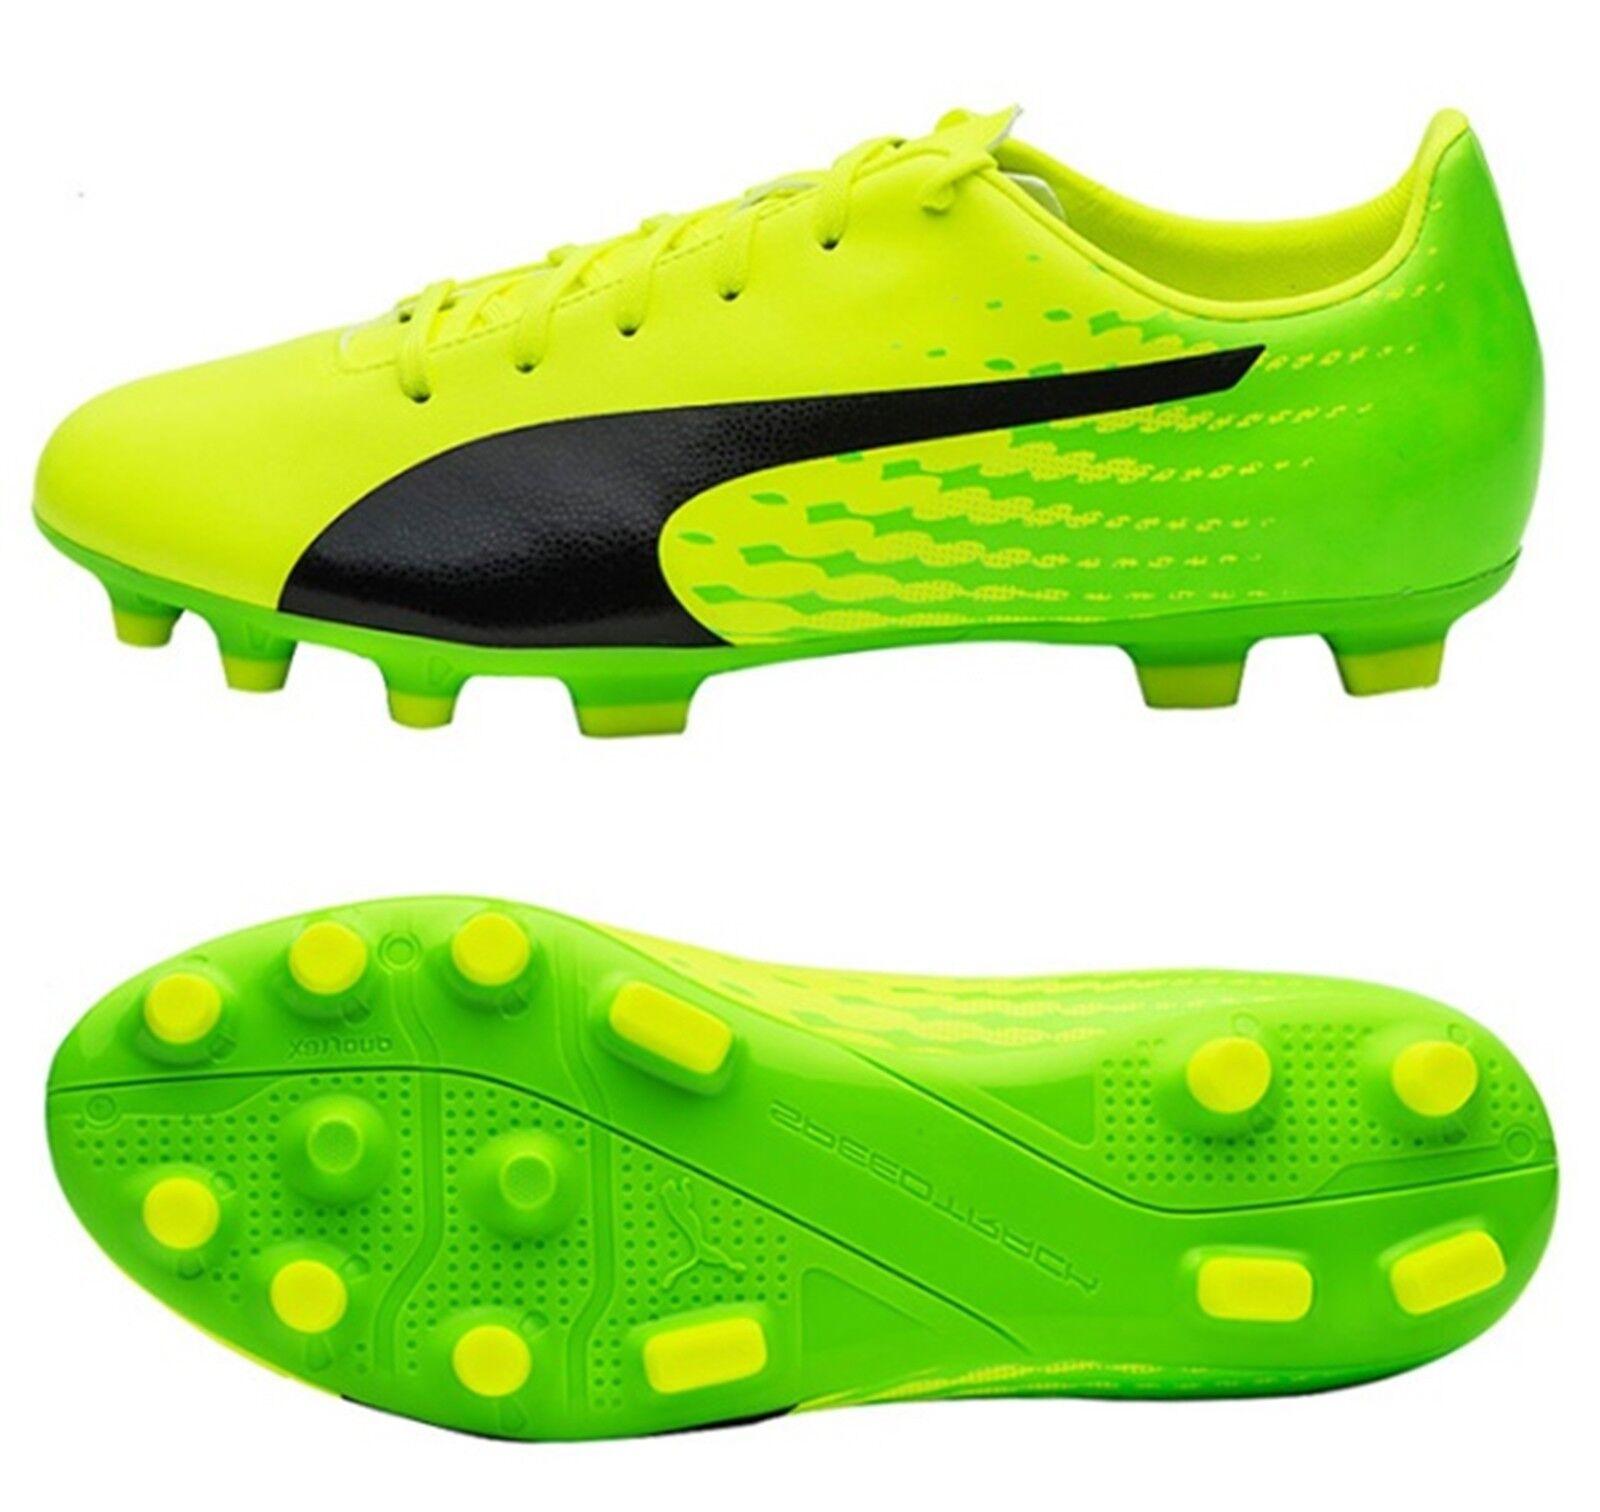 PUMA Men evoSPEED 17.5 AG Cleats Grün Soccer Football Schuhes Spike 104025-01